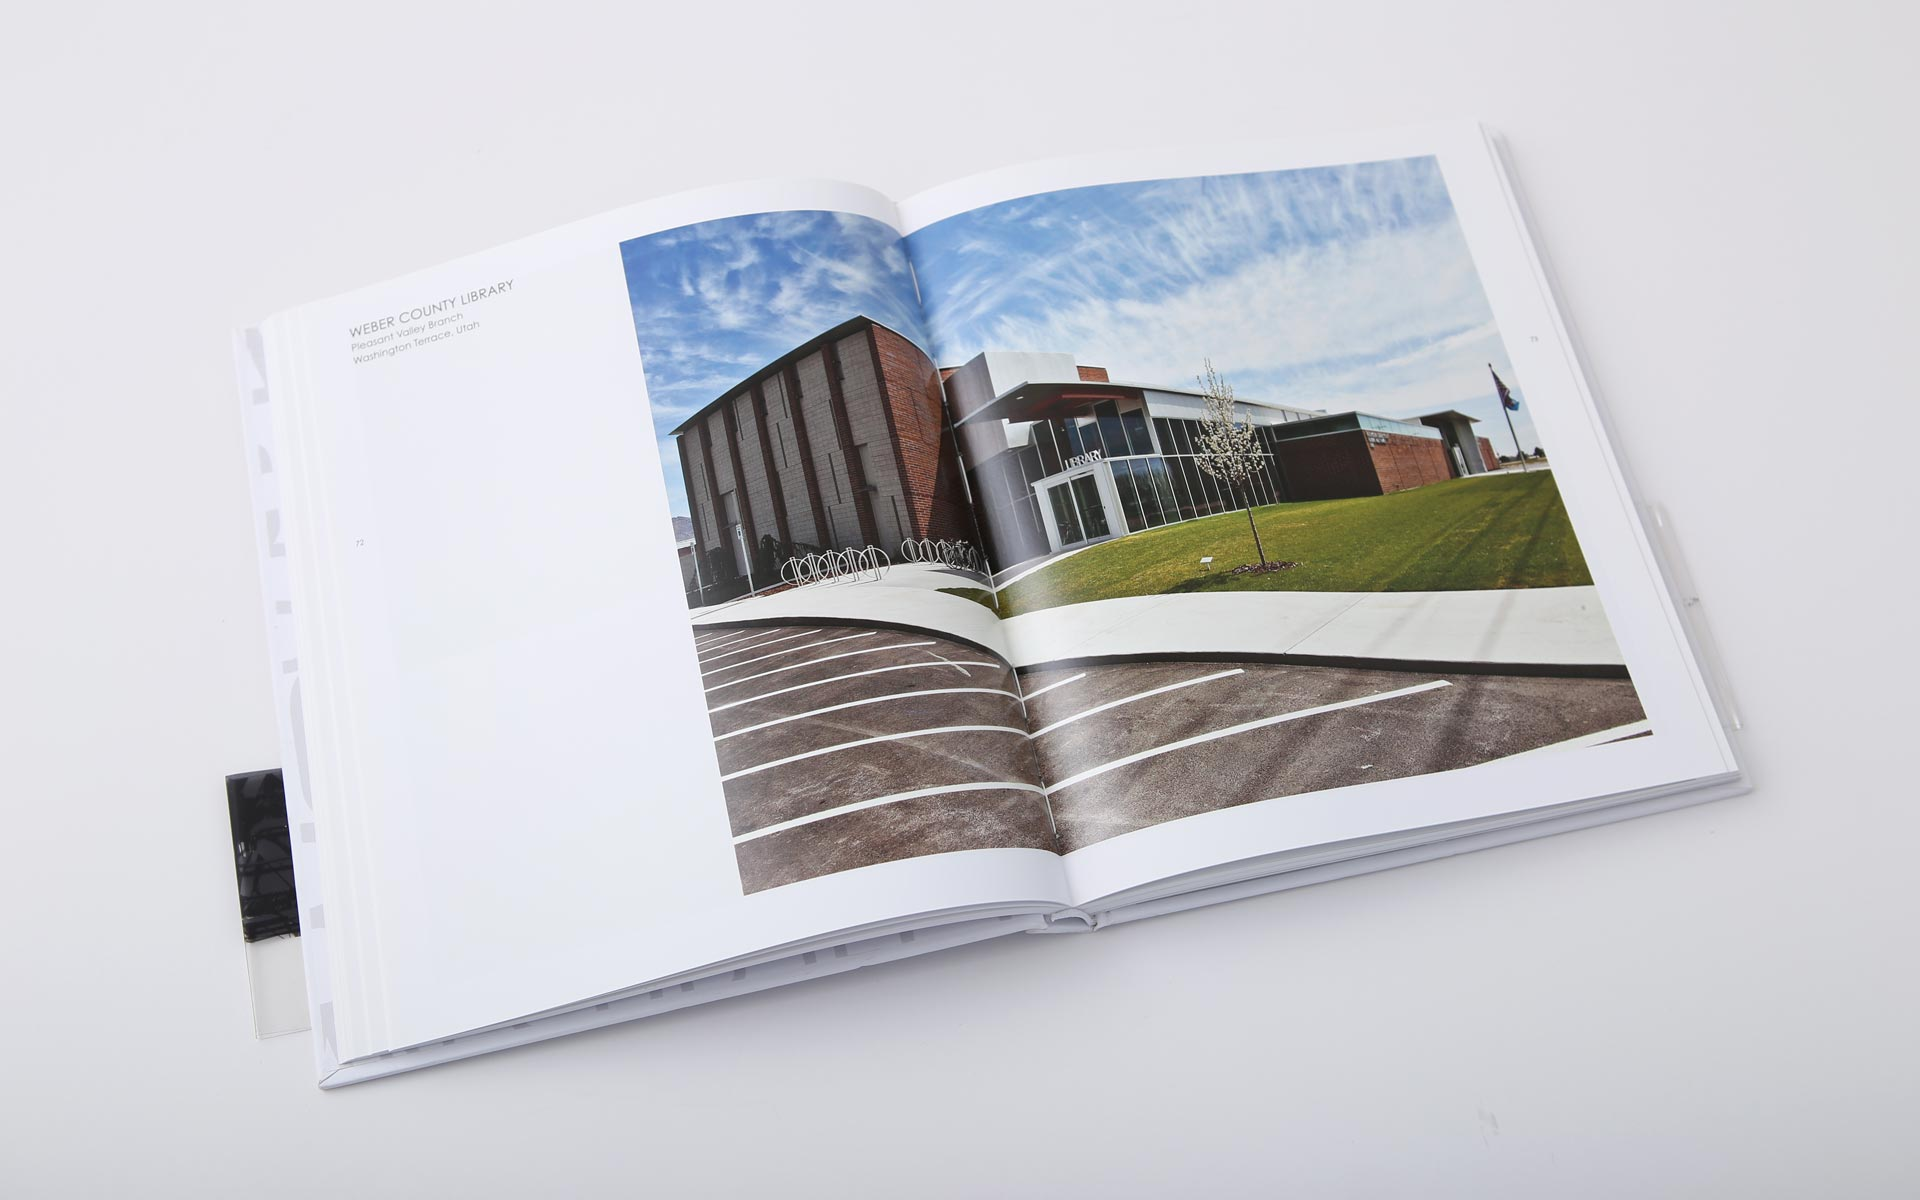 prescott-muir-architecture-book-design-4